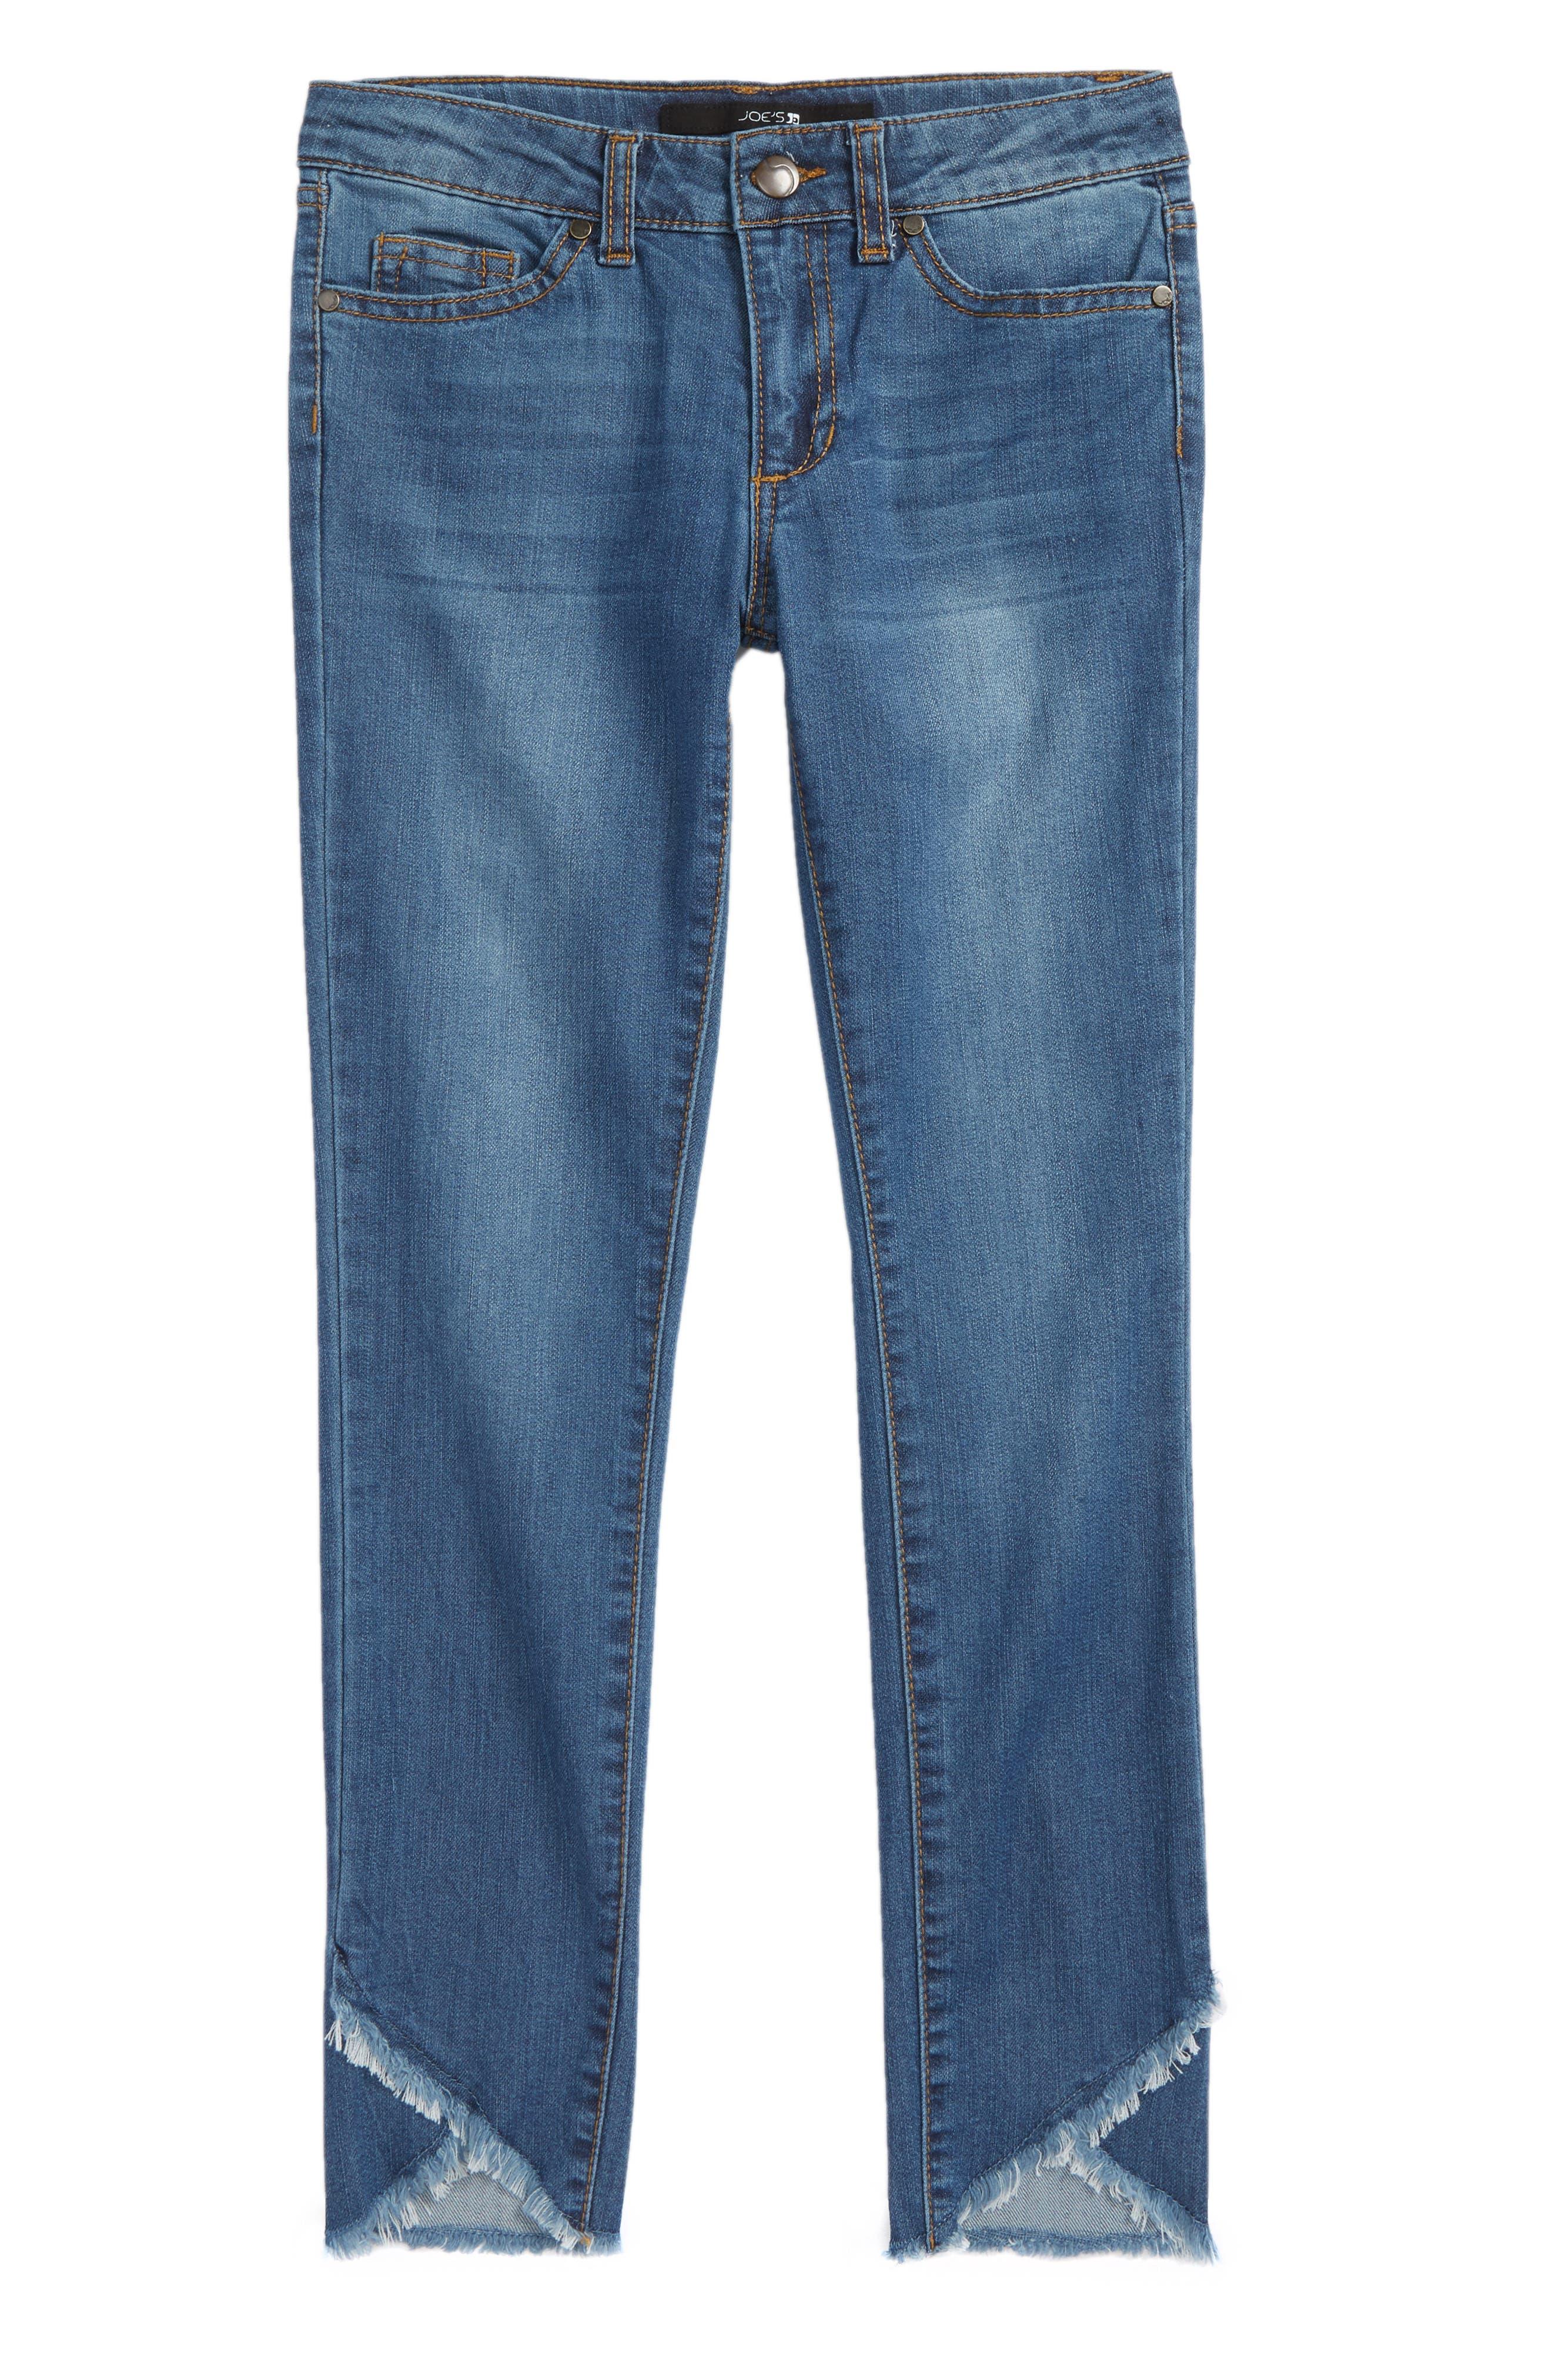 JOE'S,                             The Markie Ankle Tulip Hem Skinny Jeans,                             Main thumbnail 1, color,                             499